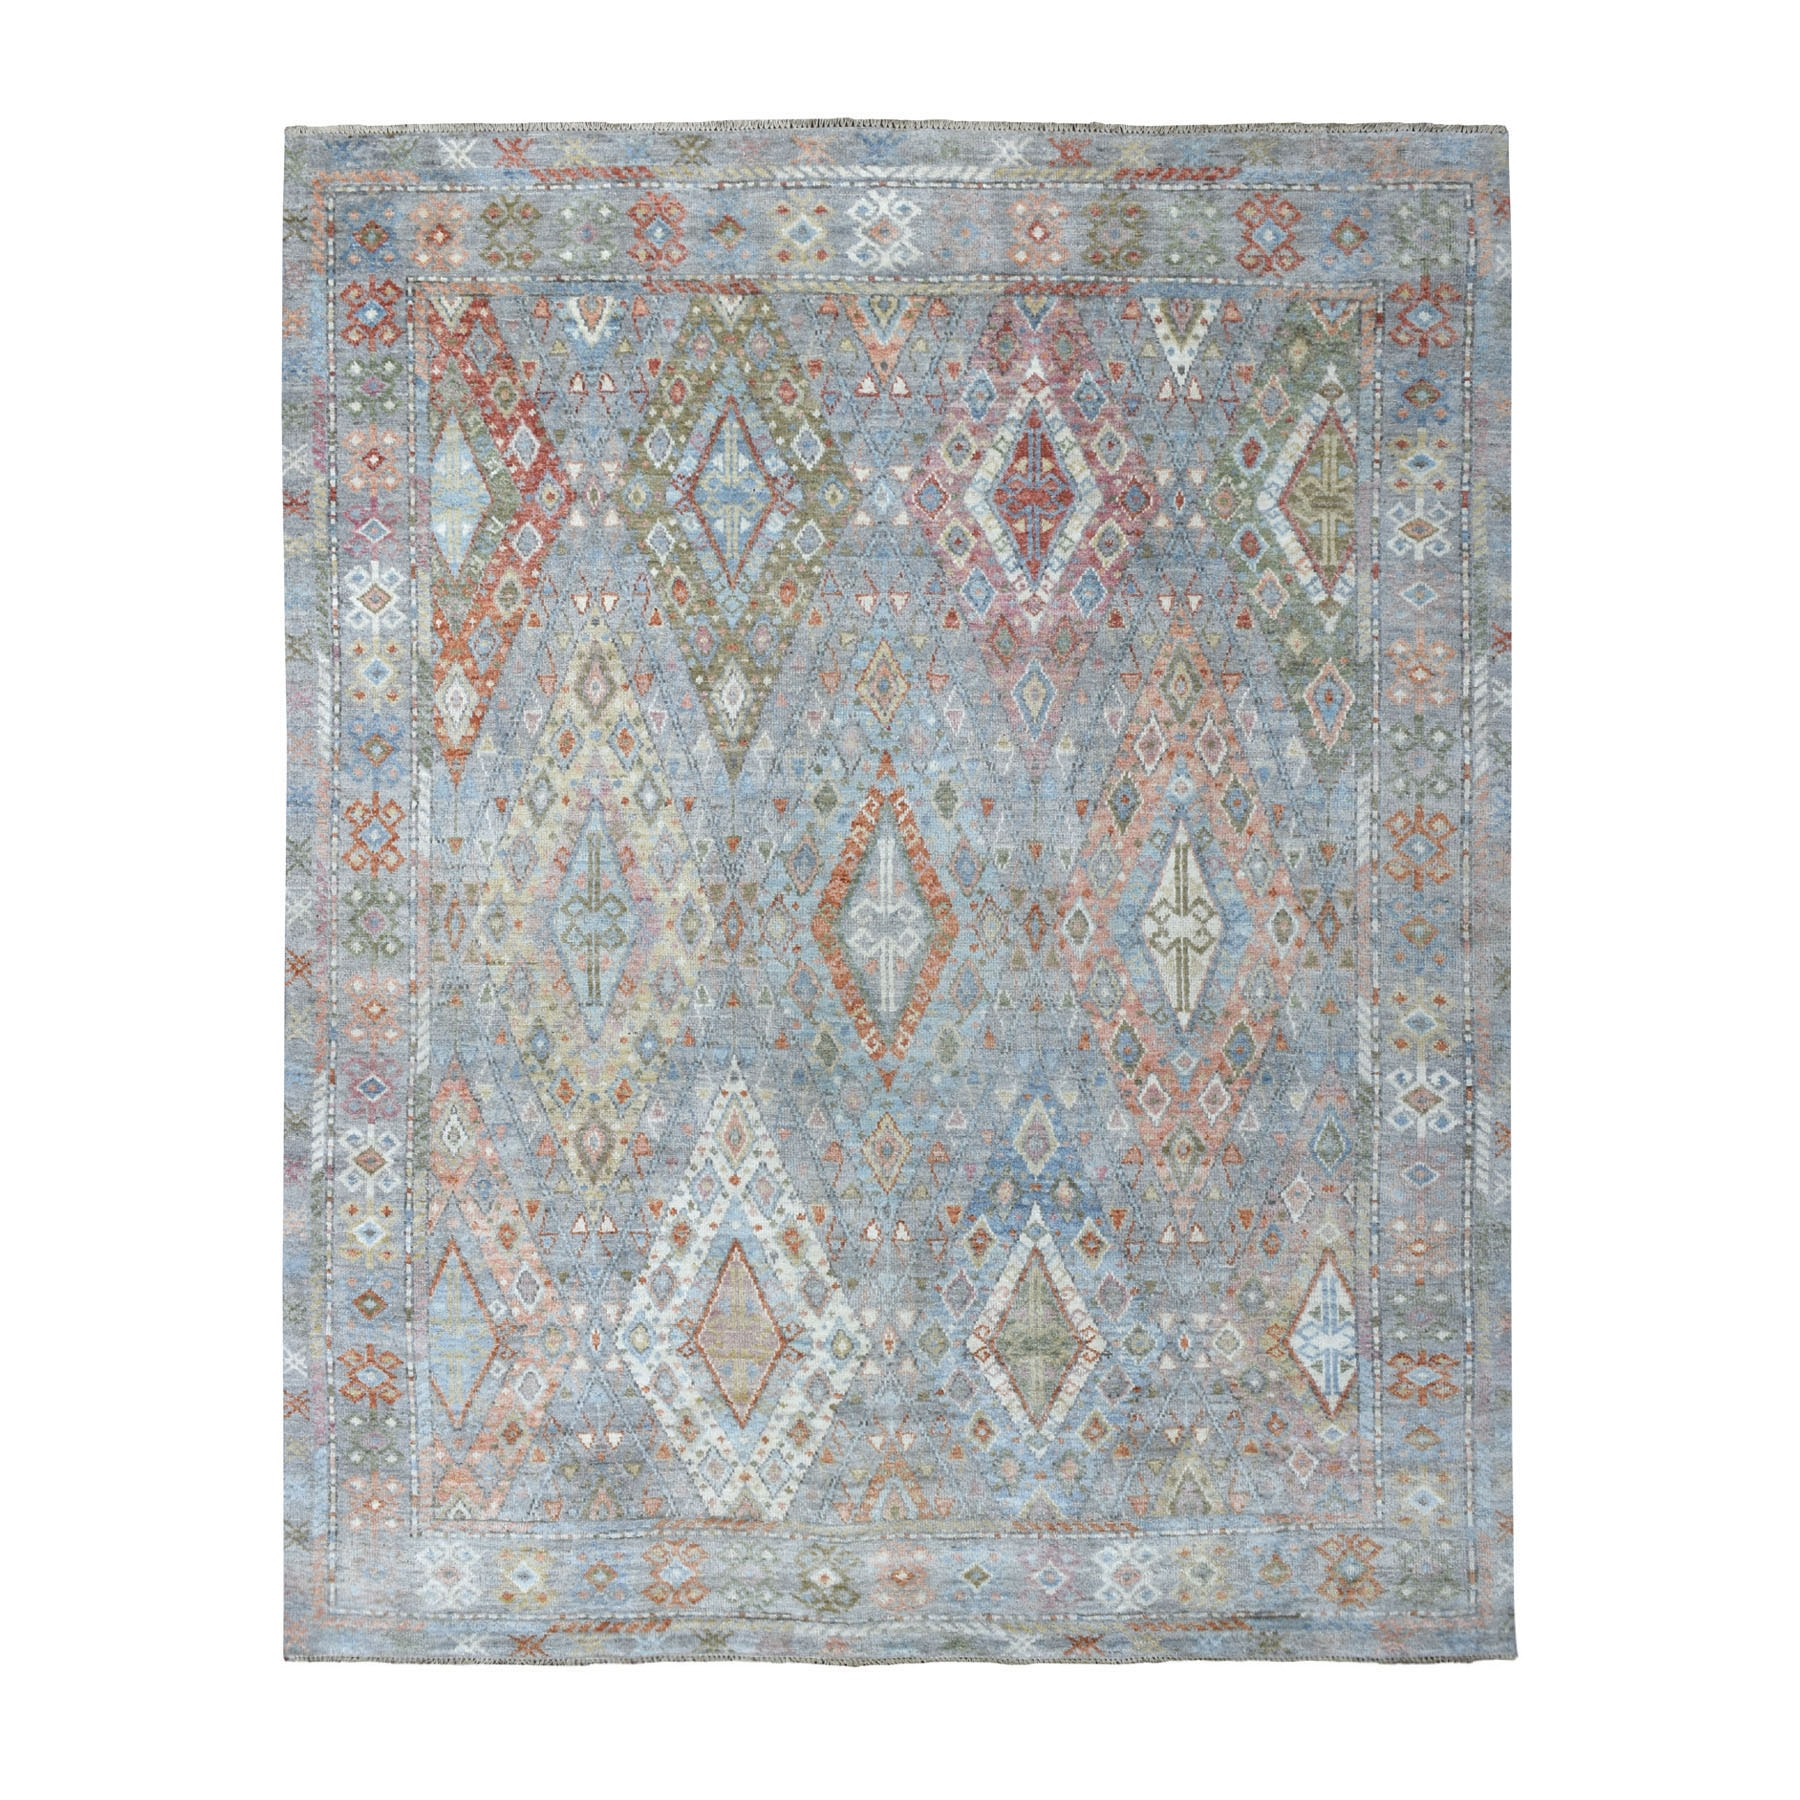 8'X10' Anatolian Collection Geometric Design Turkish Knot Oushak Soft Wool Oriental Rug moaede79